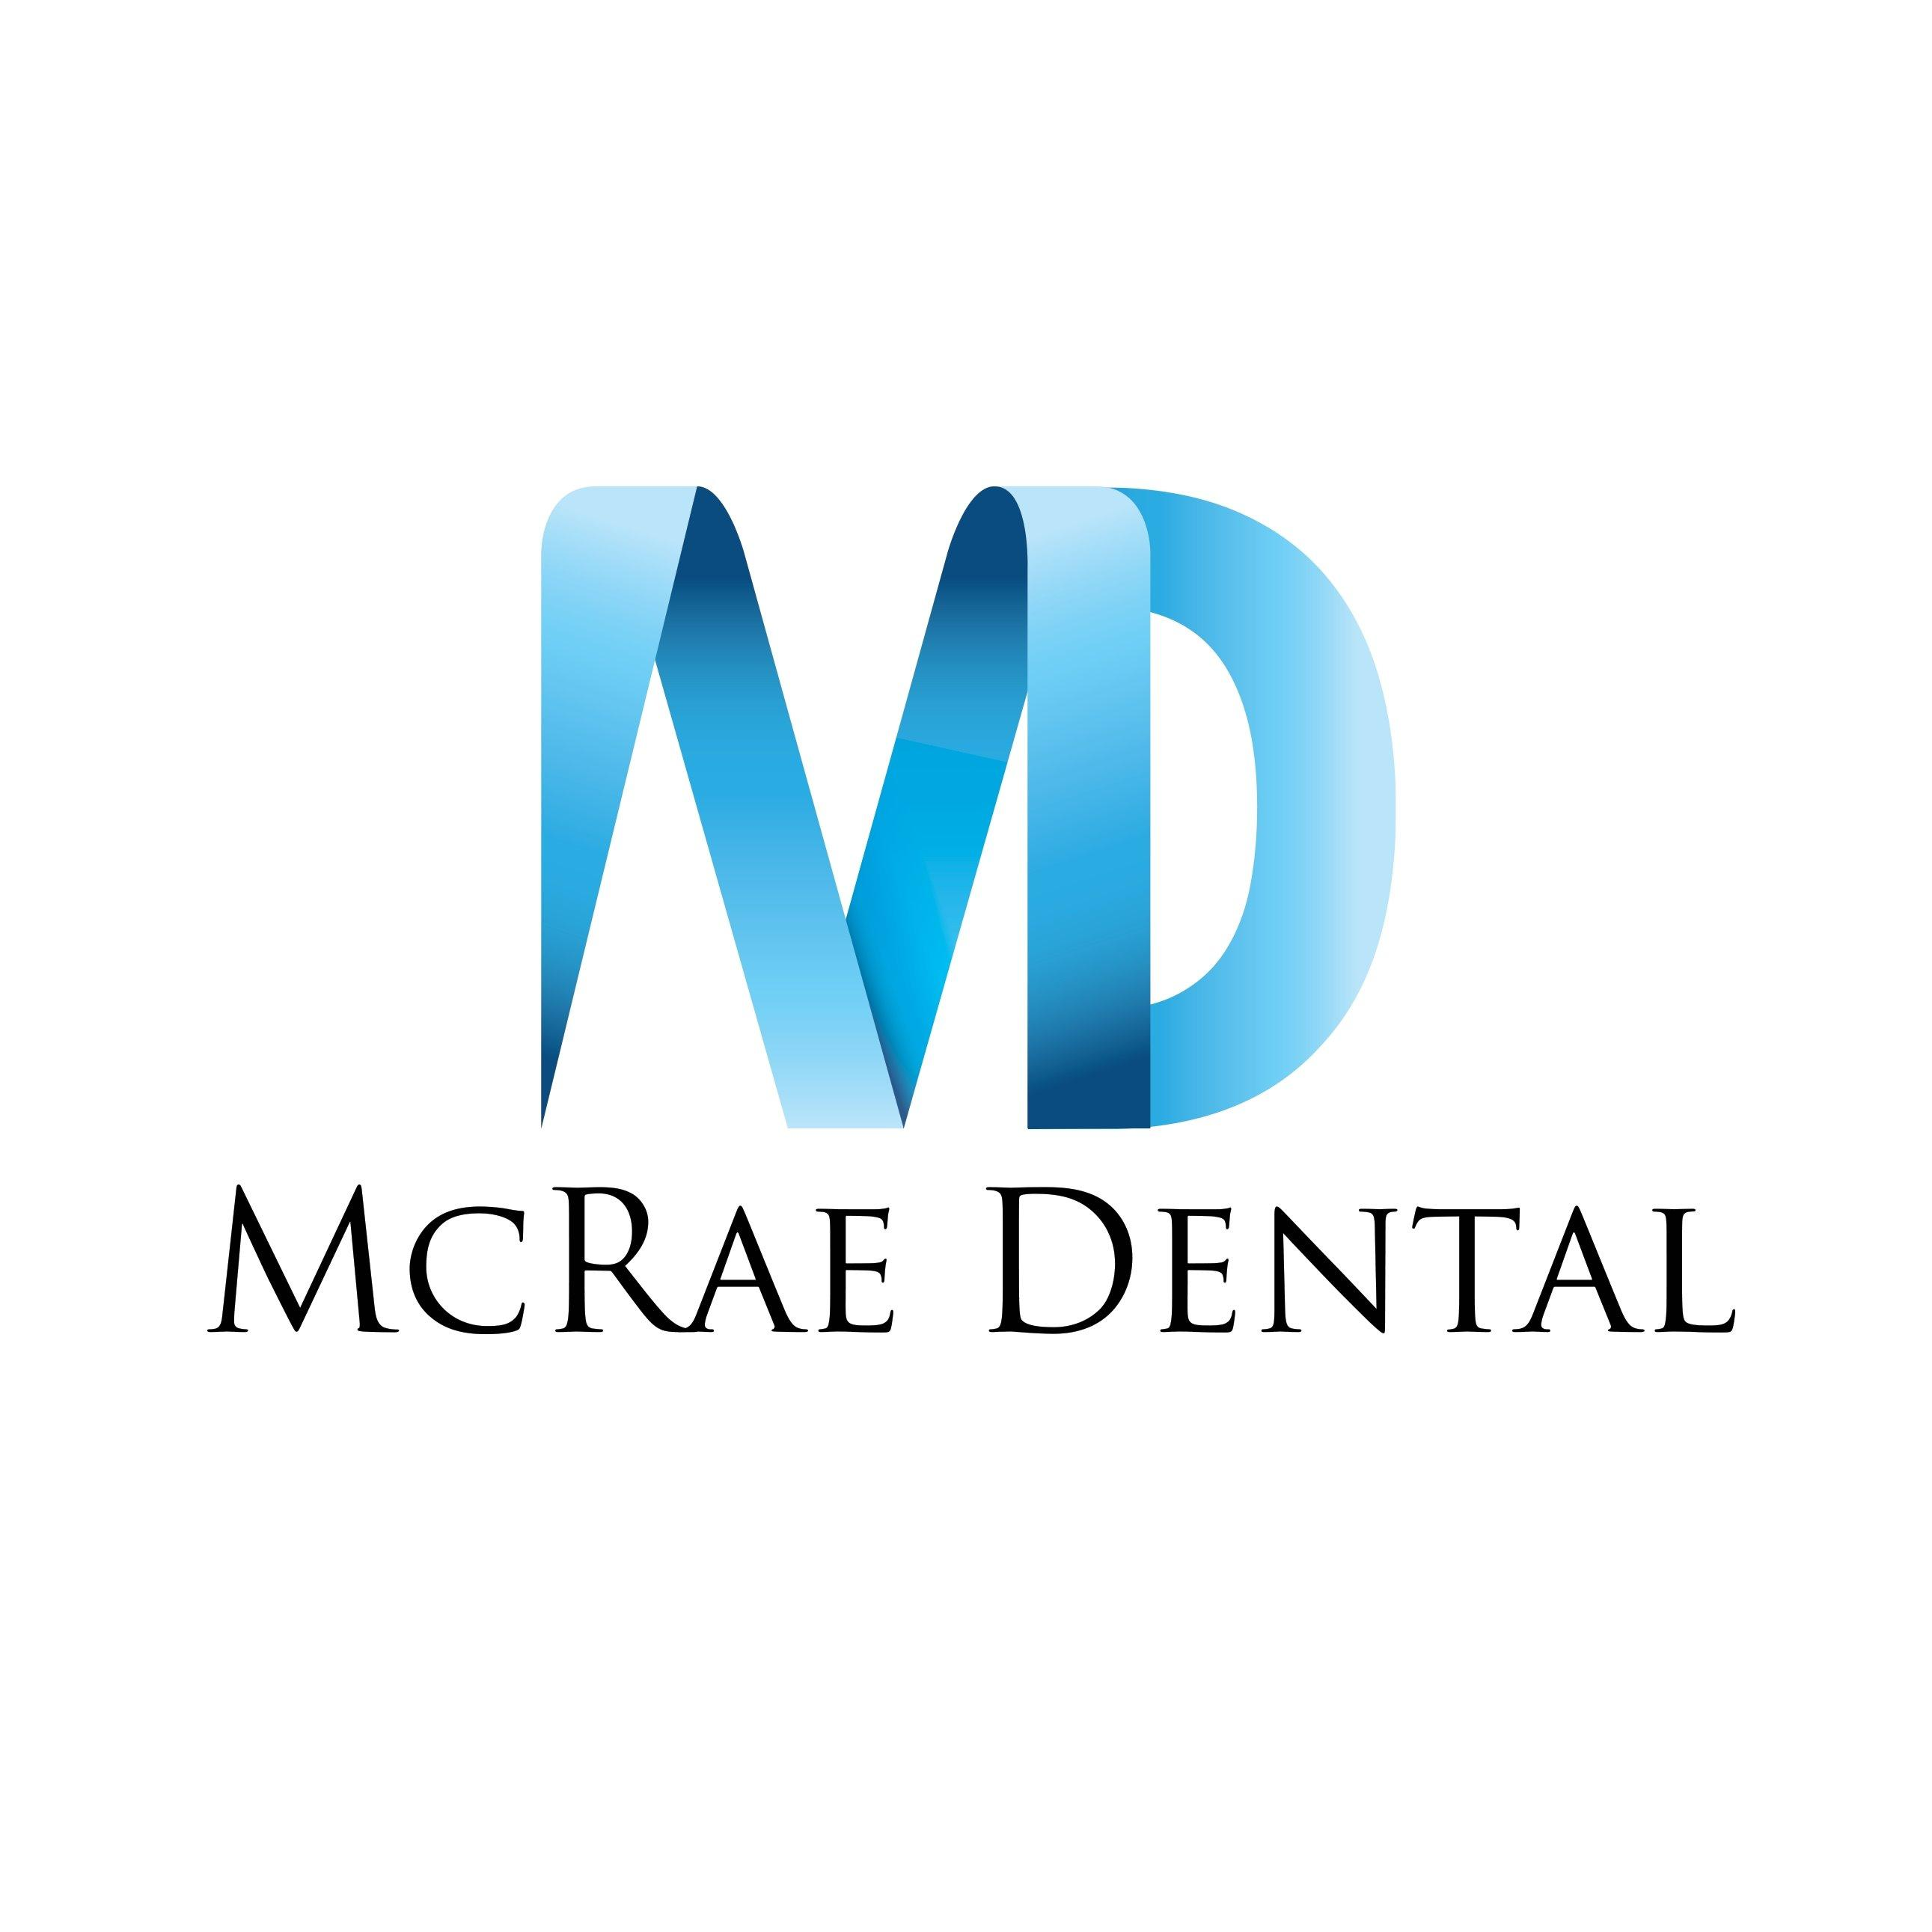 McRae Dental